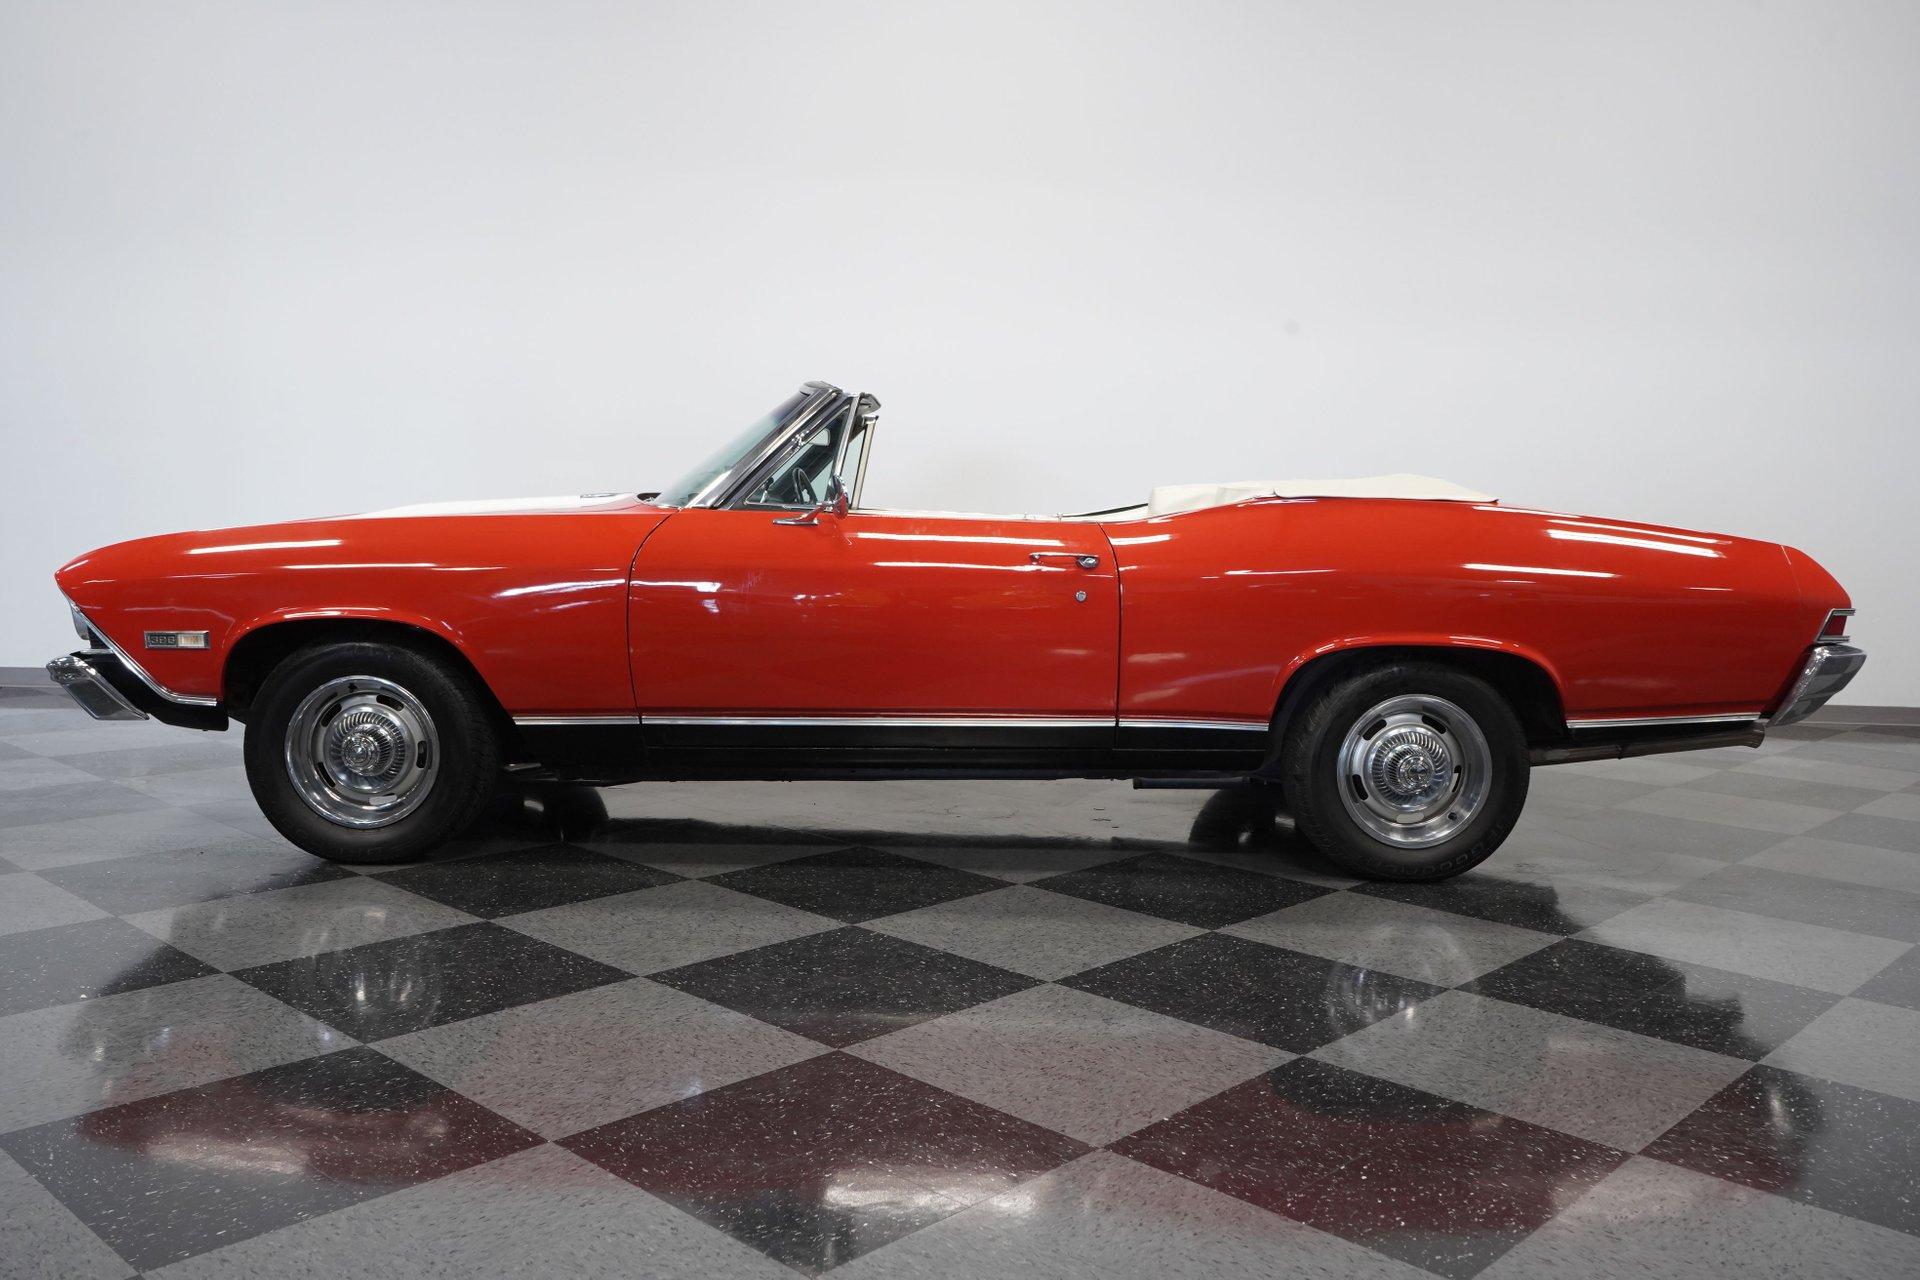 1968 chevrolet chevelle ss 396 convertible